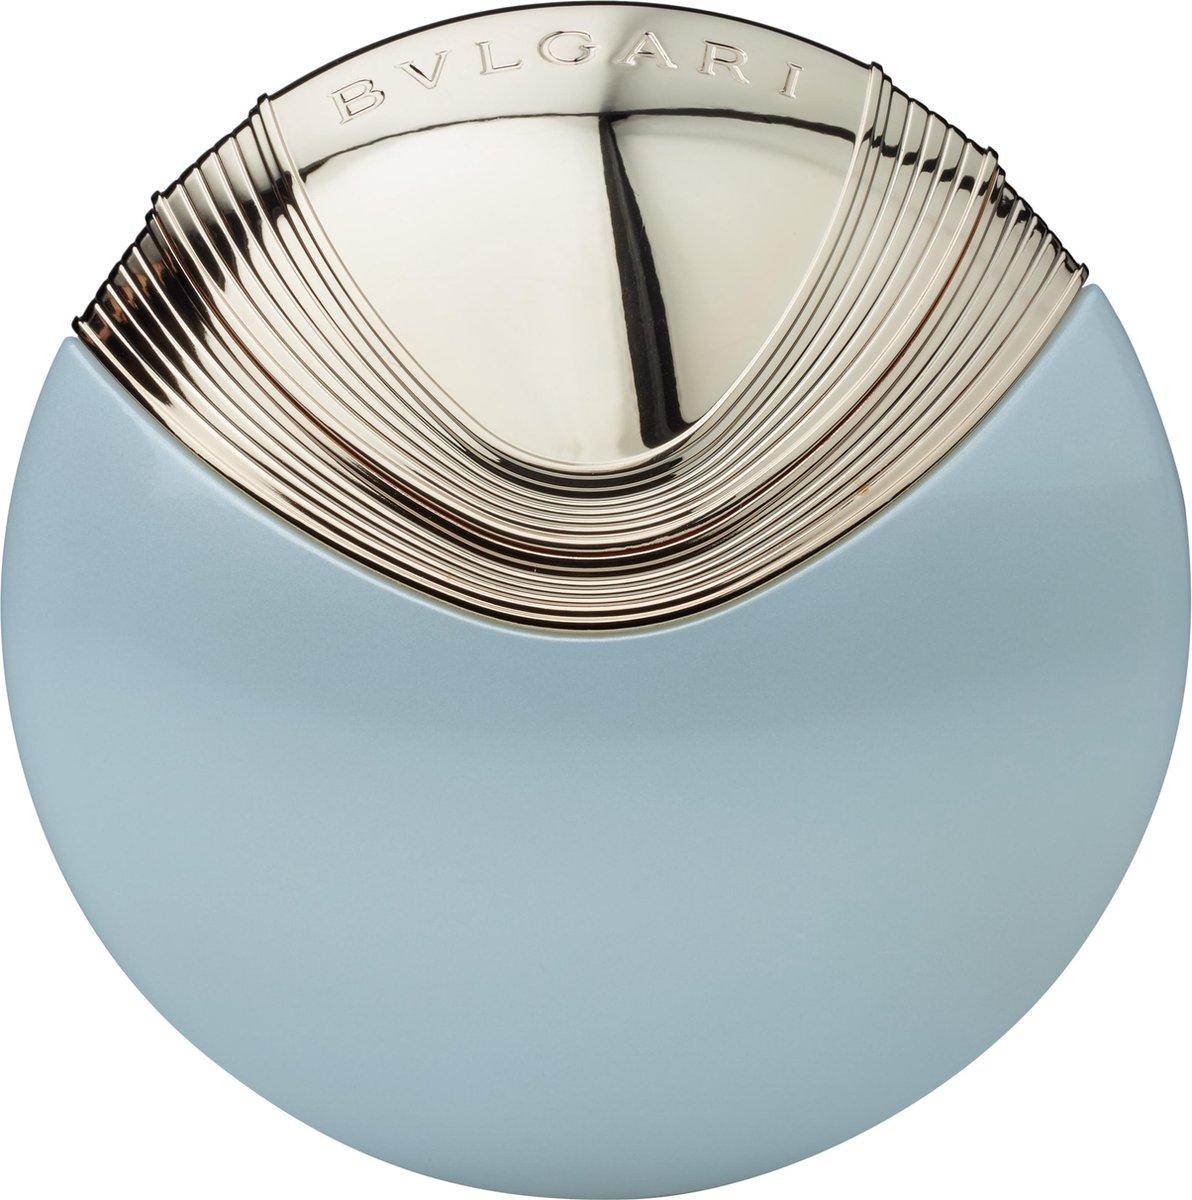 Bvlgari Aqva Divina - Geschenkset - Eau de Toilette 65 ml + Scented Soap 150 gr + Bodylotion 100 ml + Douchegel 100 ml - Bvlgari